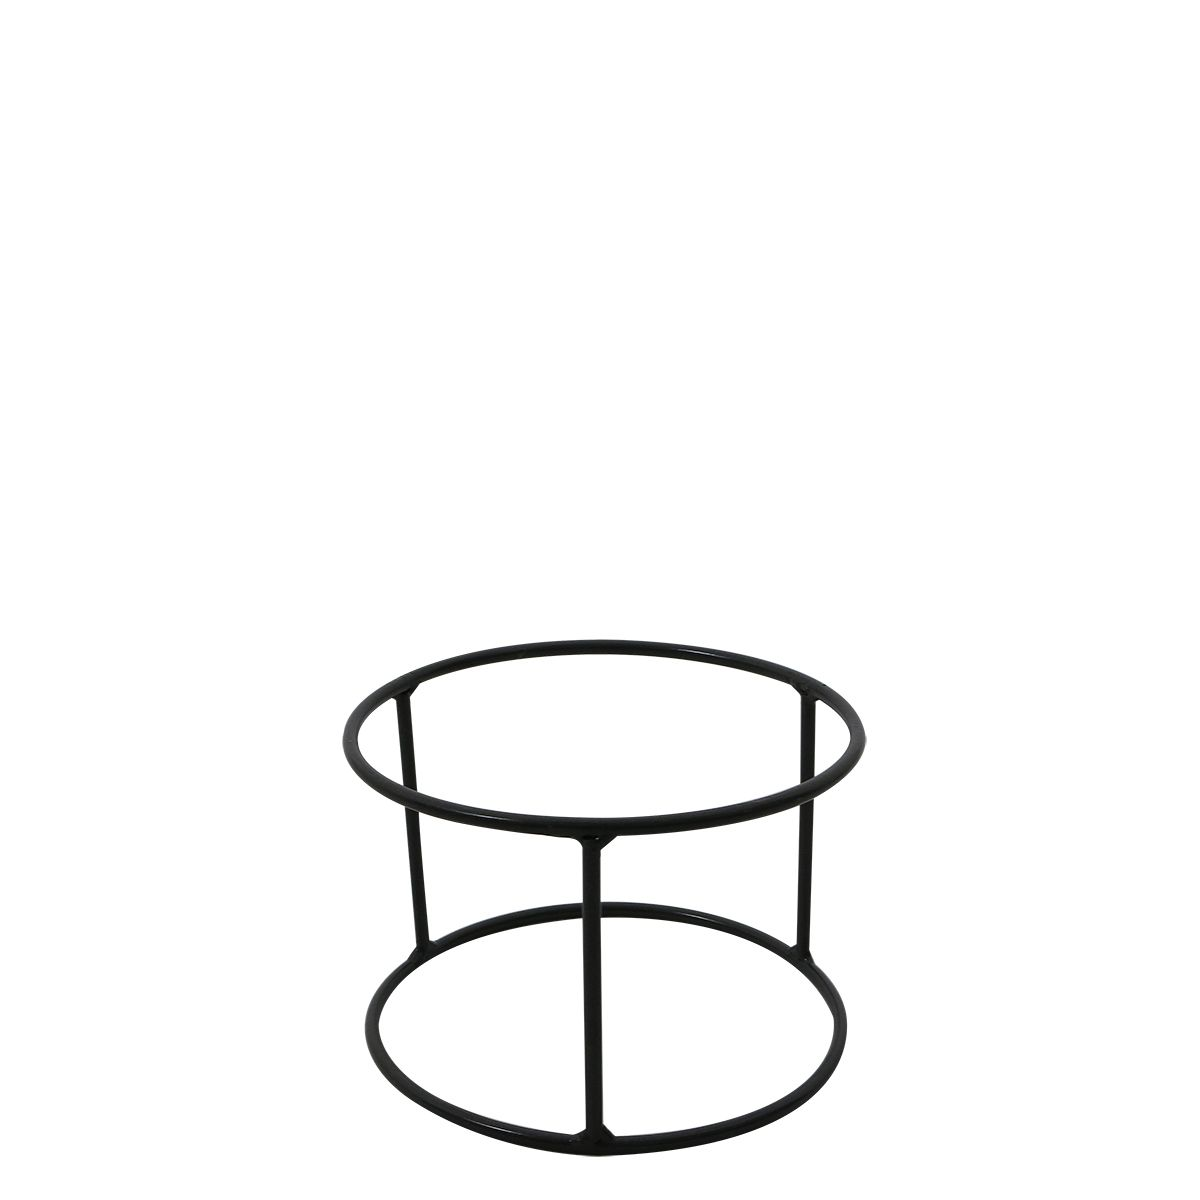 Suporte Ferro Vaso Loft 14 x 10 cm Grafite - VASART